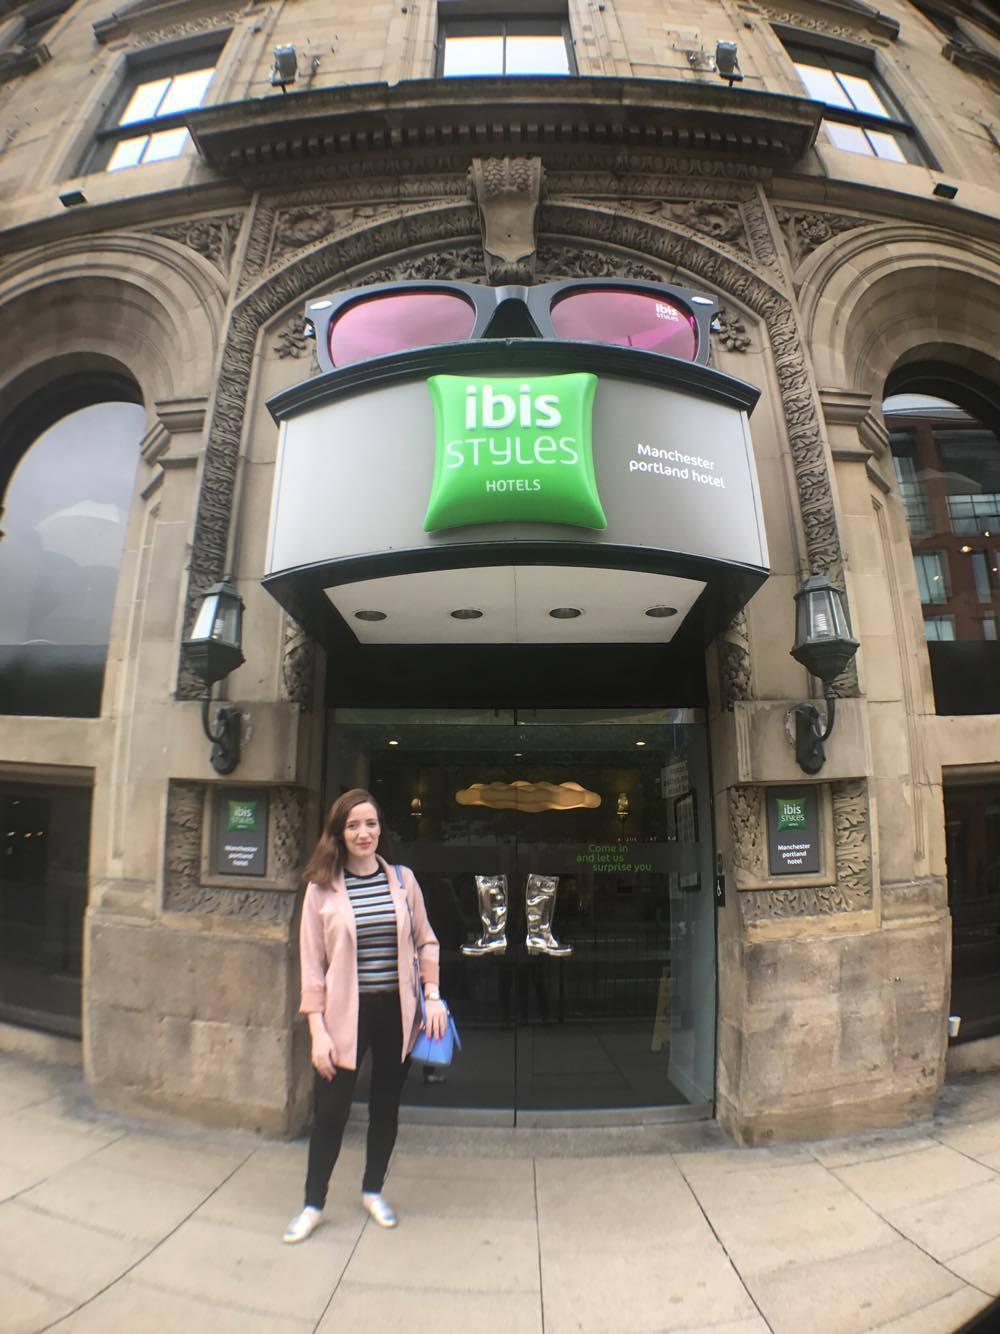 Ibis Styles Manchester Portland